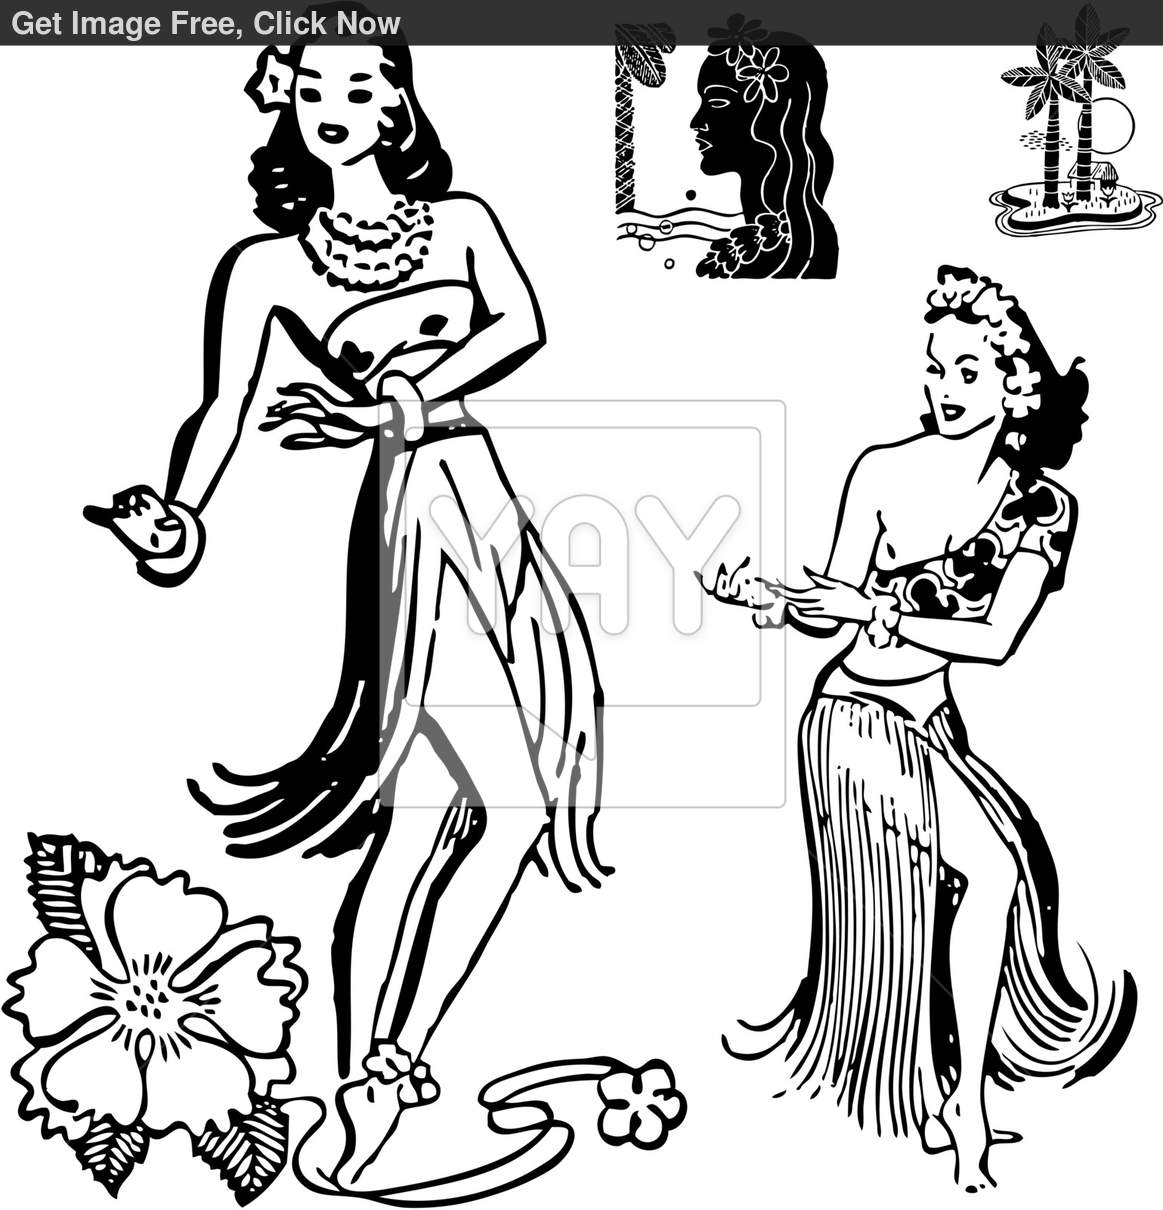 9 hula girl vector images hula girl silhouette clip art for Hula girl coloring page